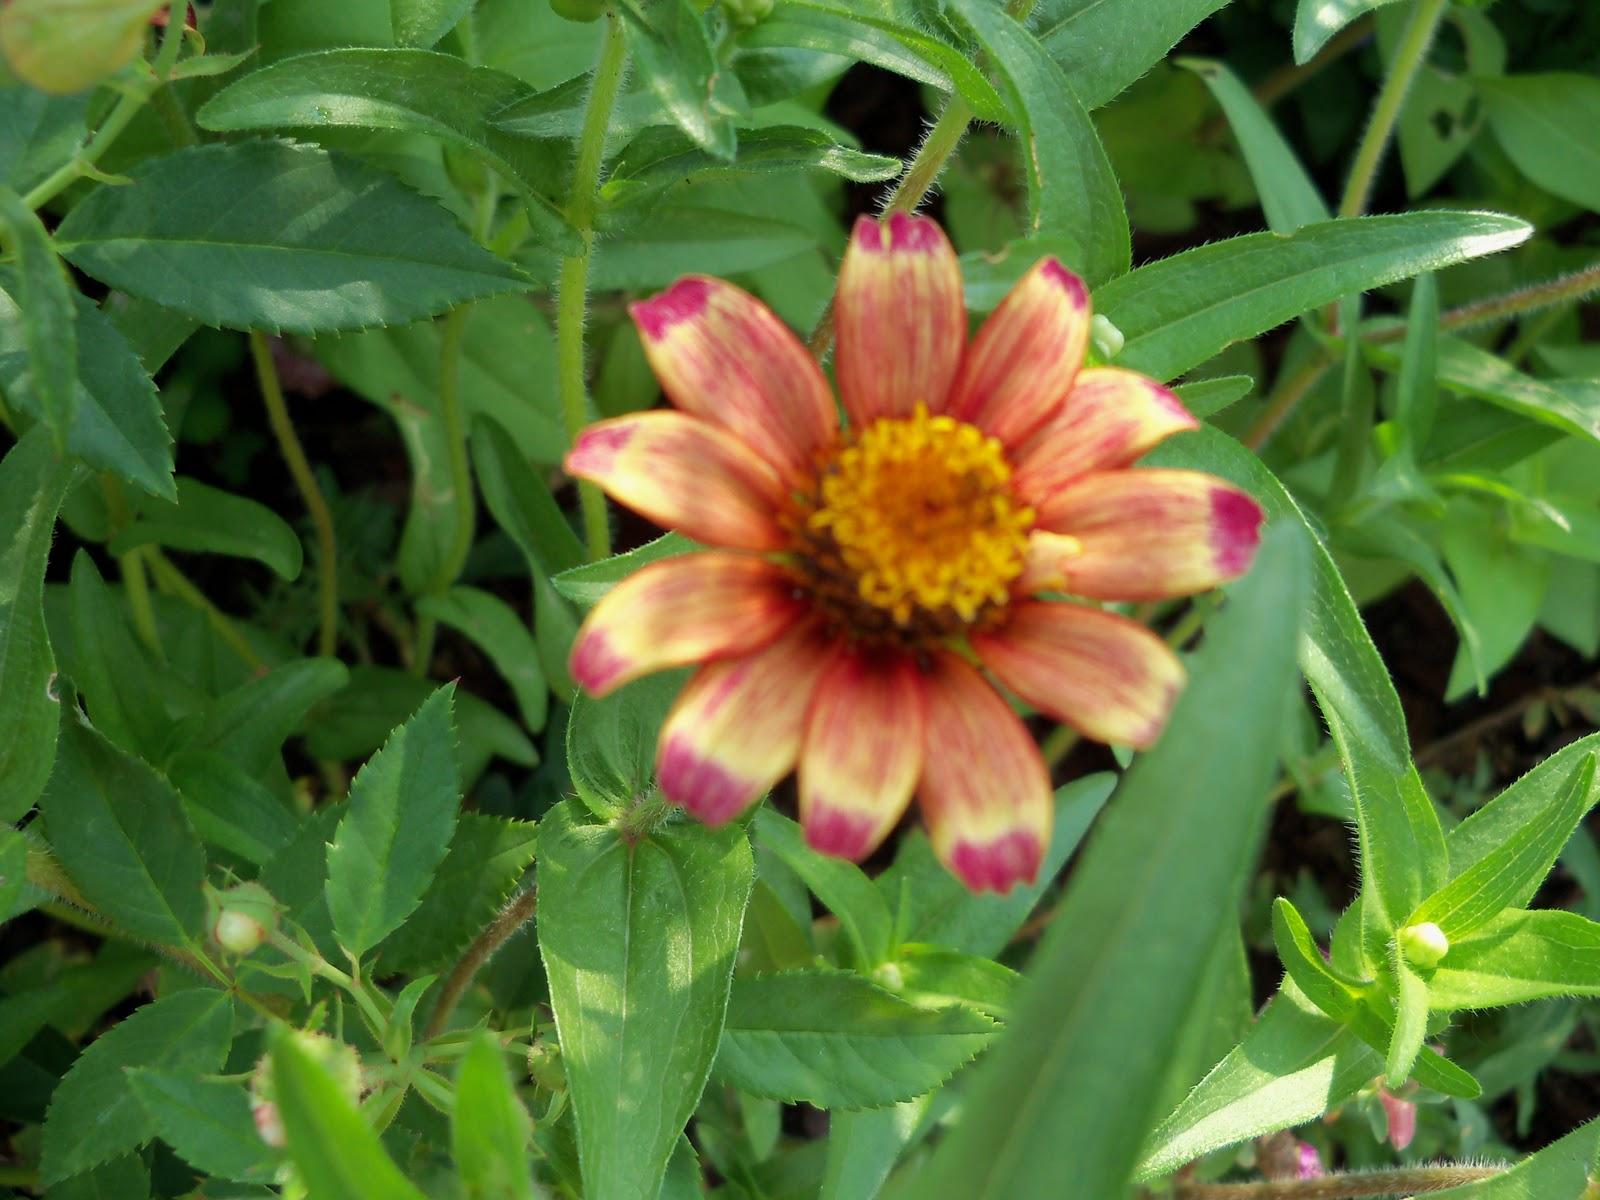 Gardening 2010, Part Two - 101_3292.JPG